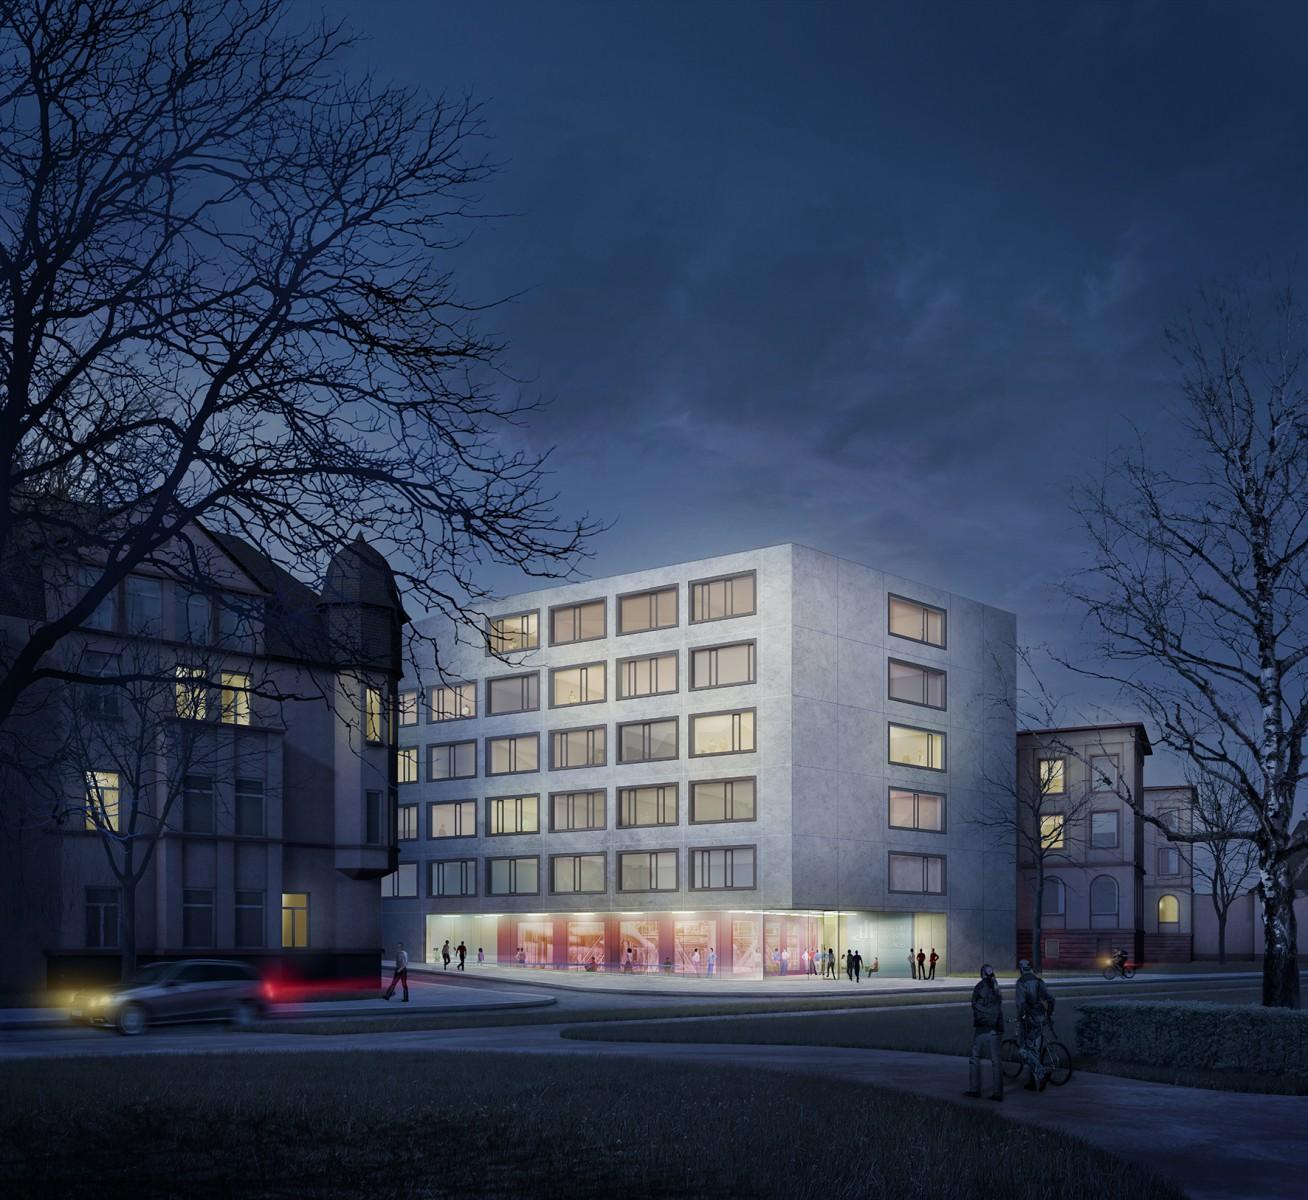 WB Neubau Gebäude 7, FUA, Frankfurt am Main